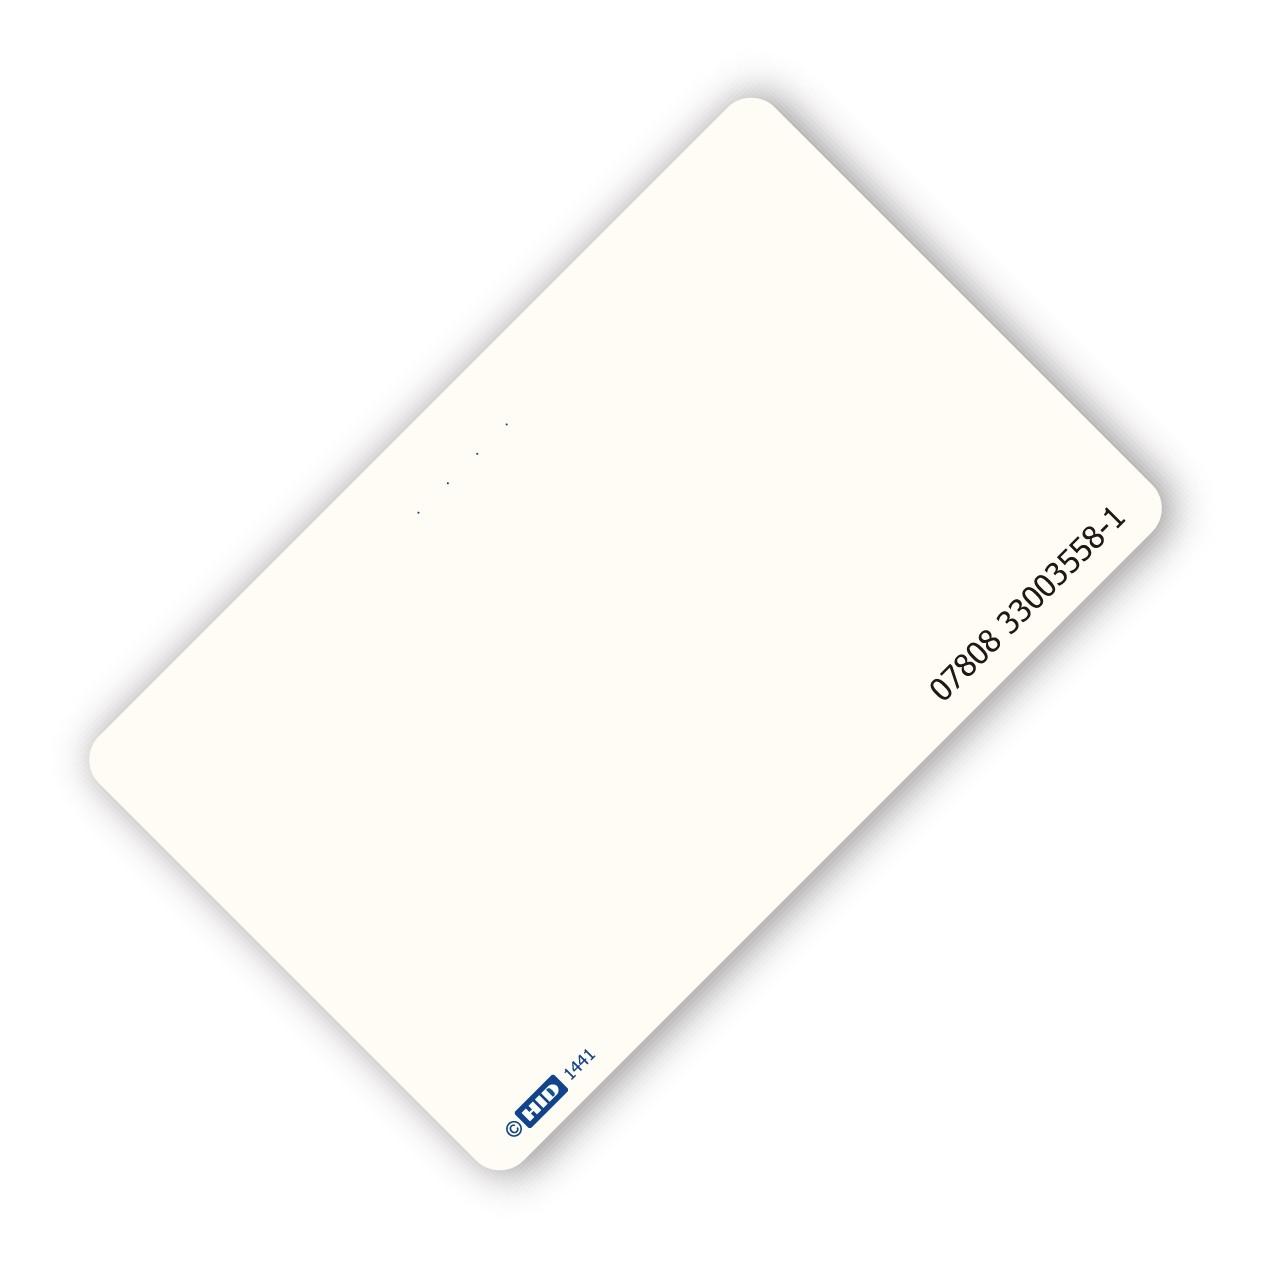 HID Card HID 1441 HID Composite Card HID+Mifare 4K S50 Composite Card HID 1441 Card